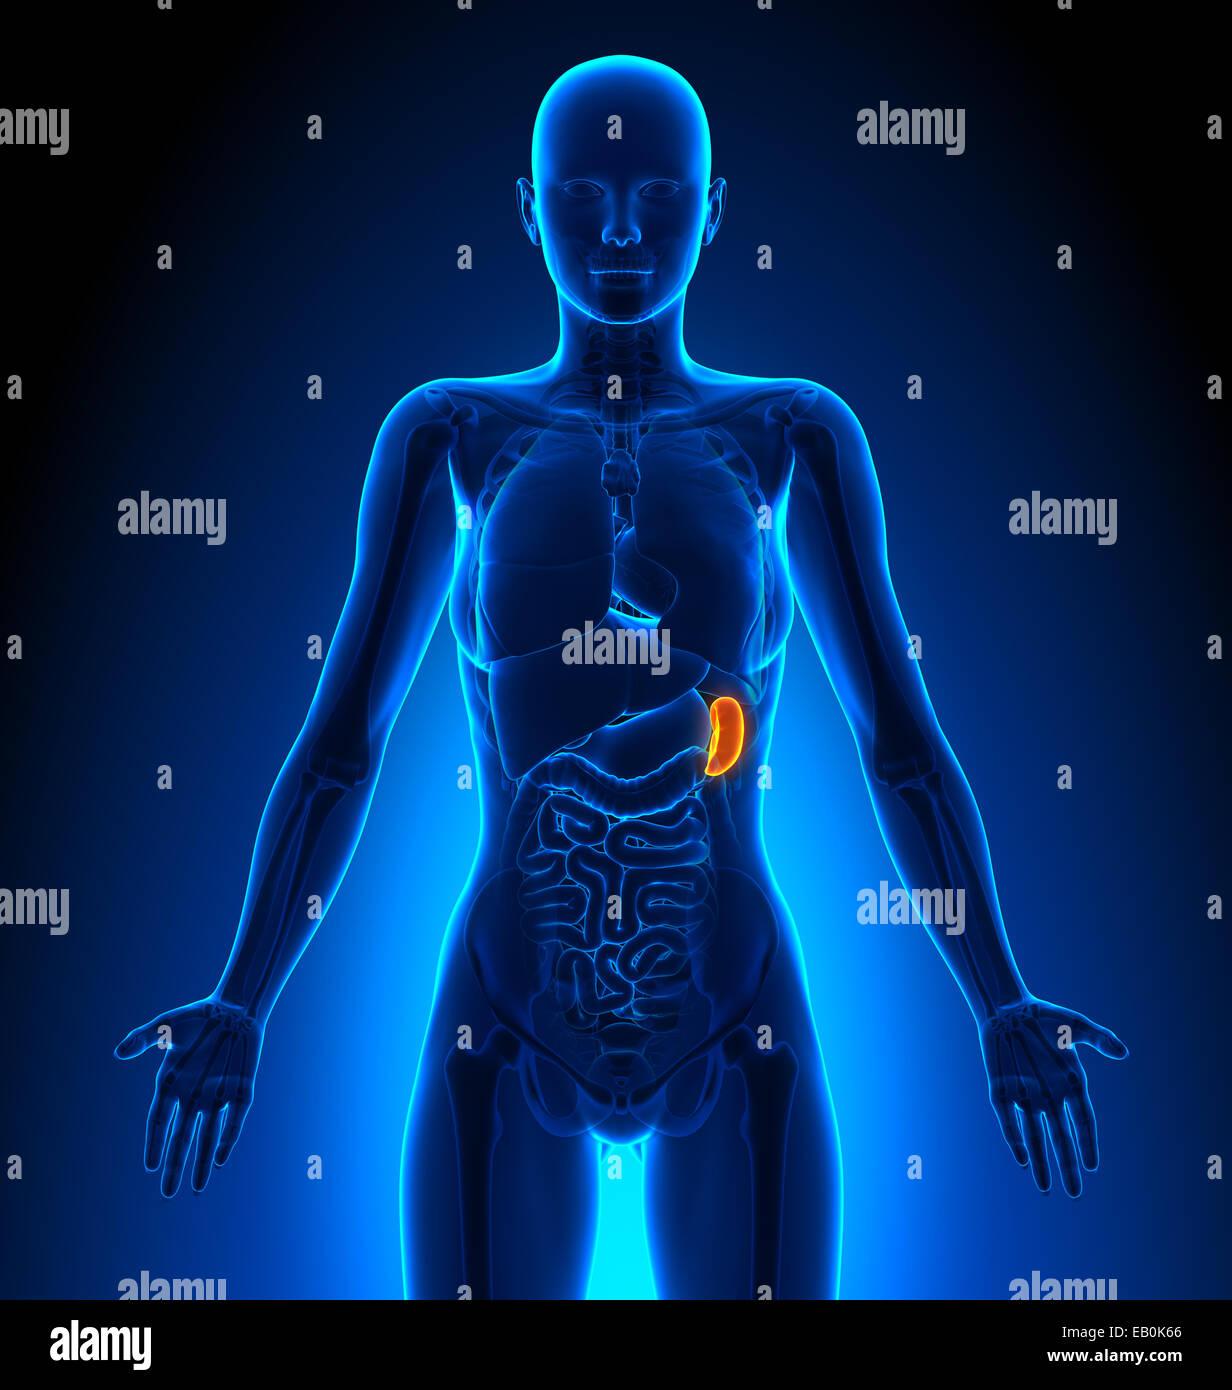 Spleen - Female Organs - Human Anatomy Stock Photo: 75617758 - Alamy